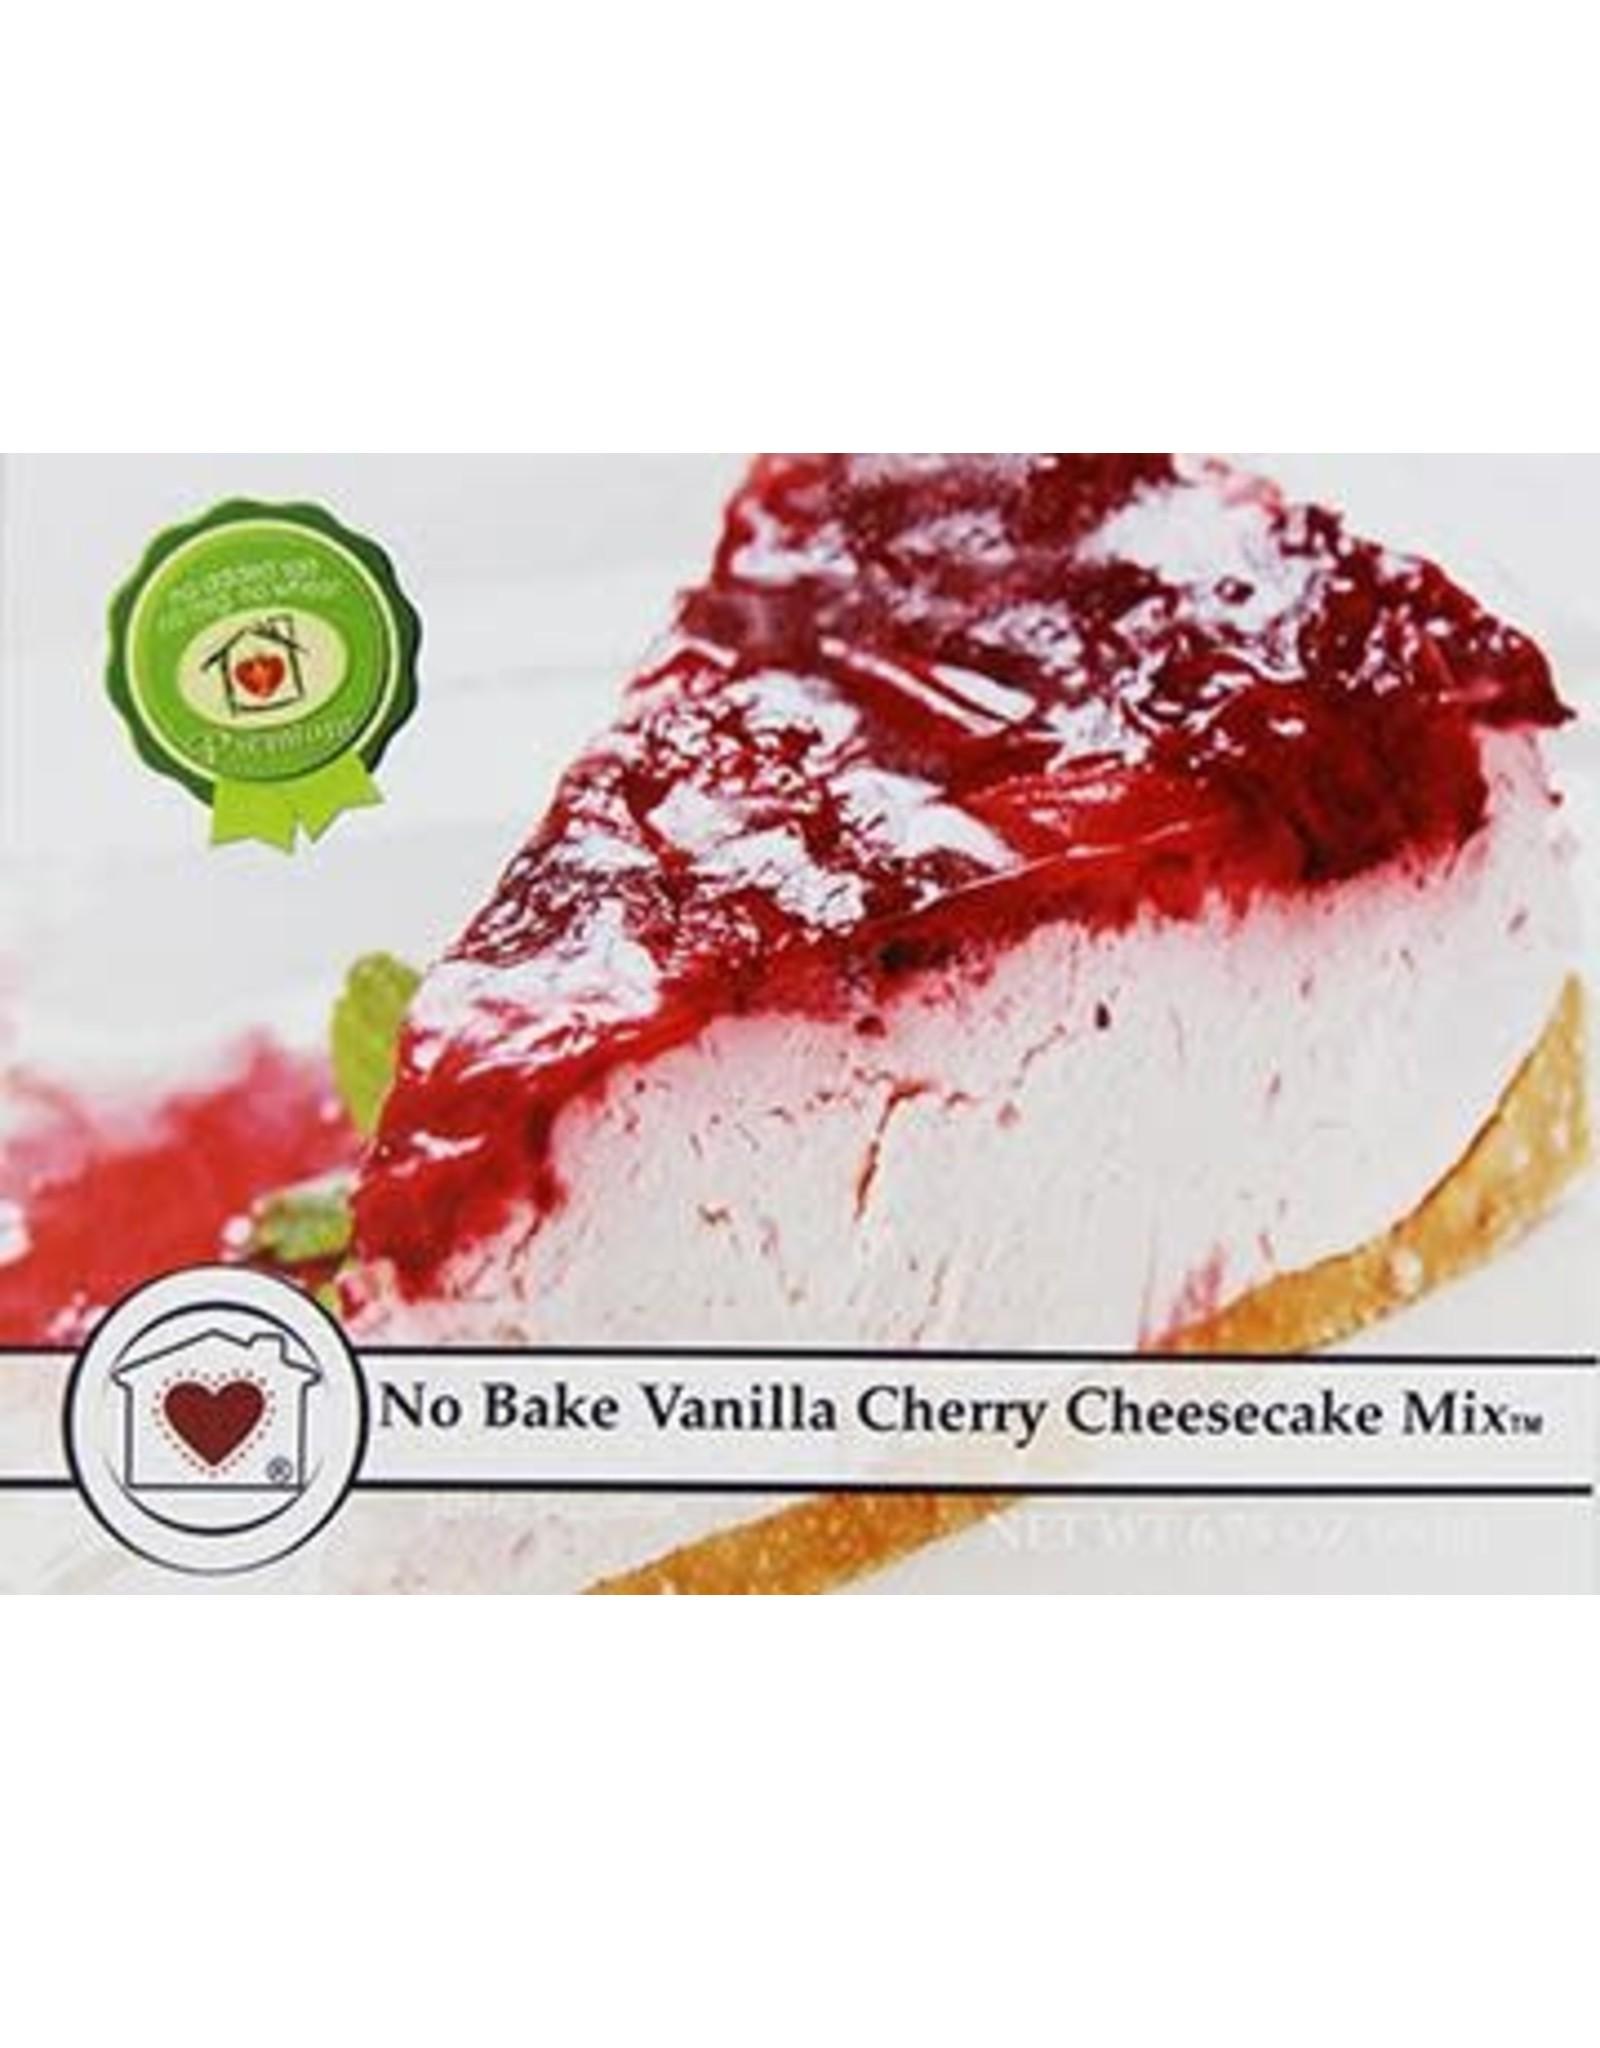 Country Home Creations NO BAKE VANILLA CHERRY CHEESECAKE MIX